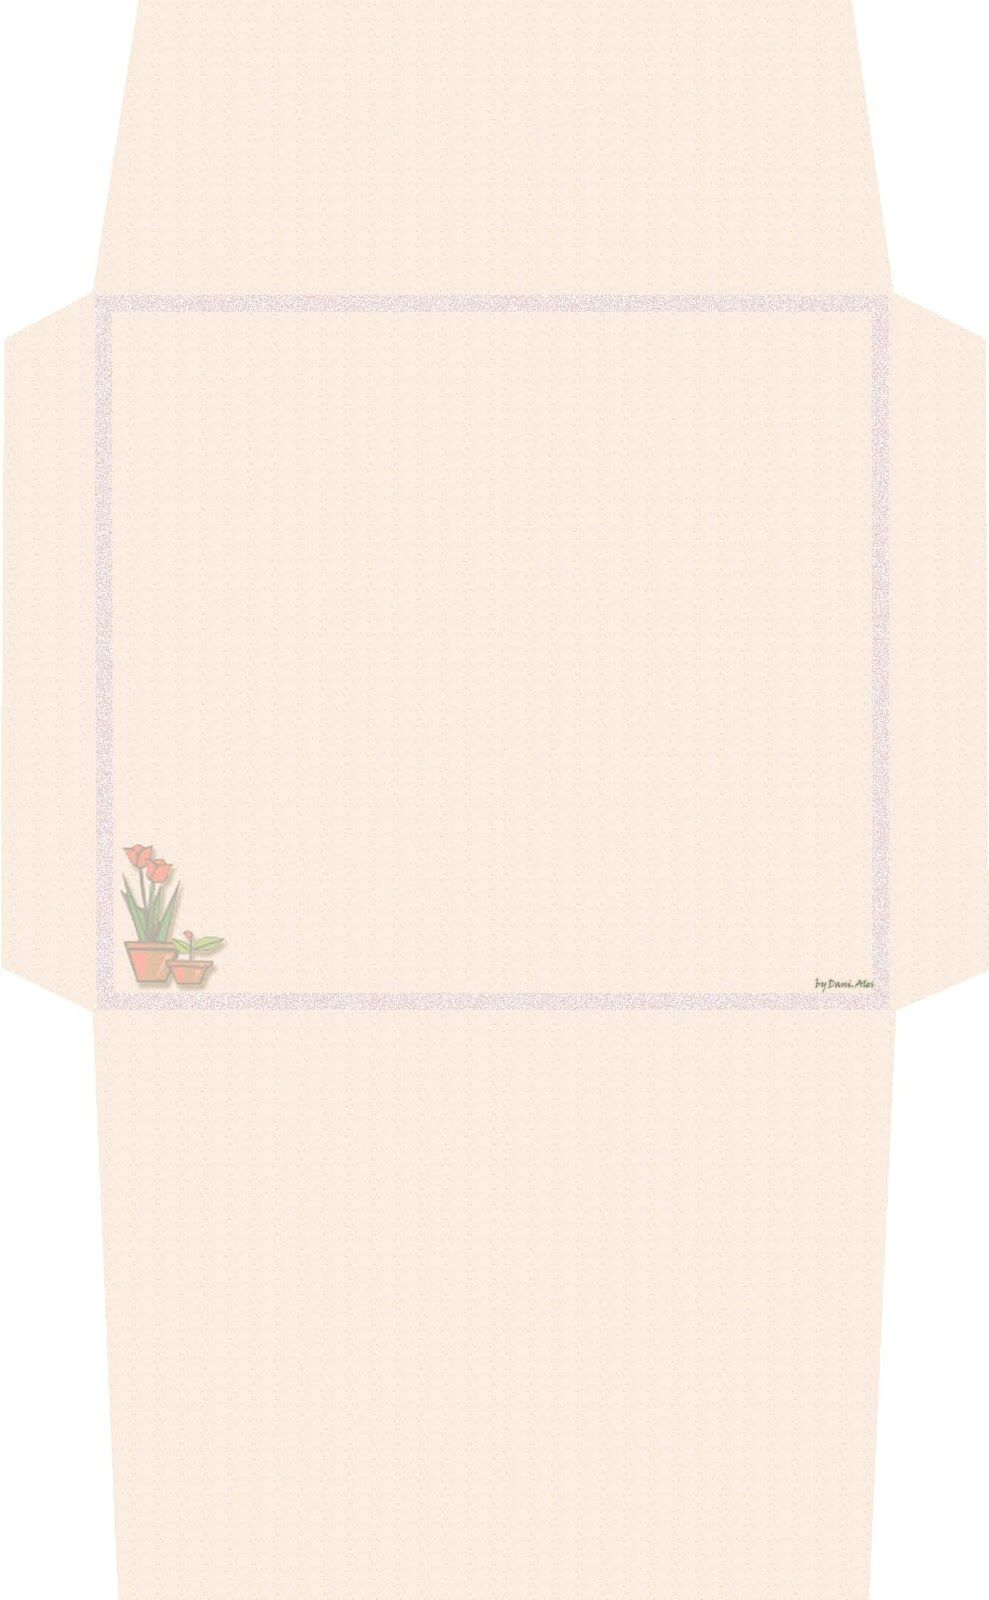 Pin de Patricia Helena en ilustração | Pinterest | Papel, Hoja y ...